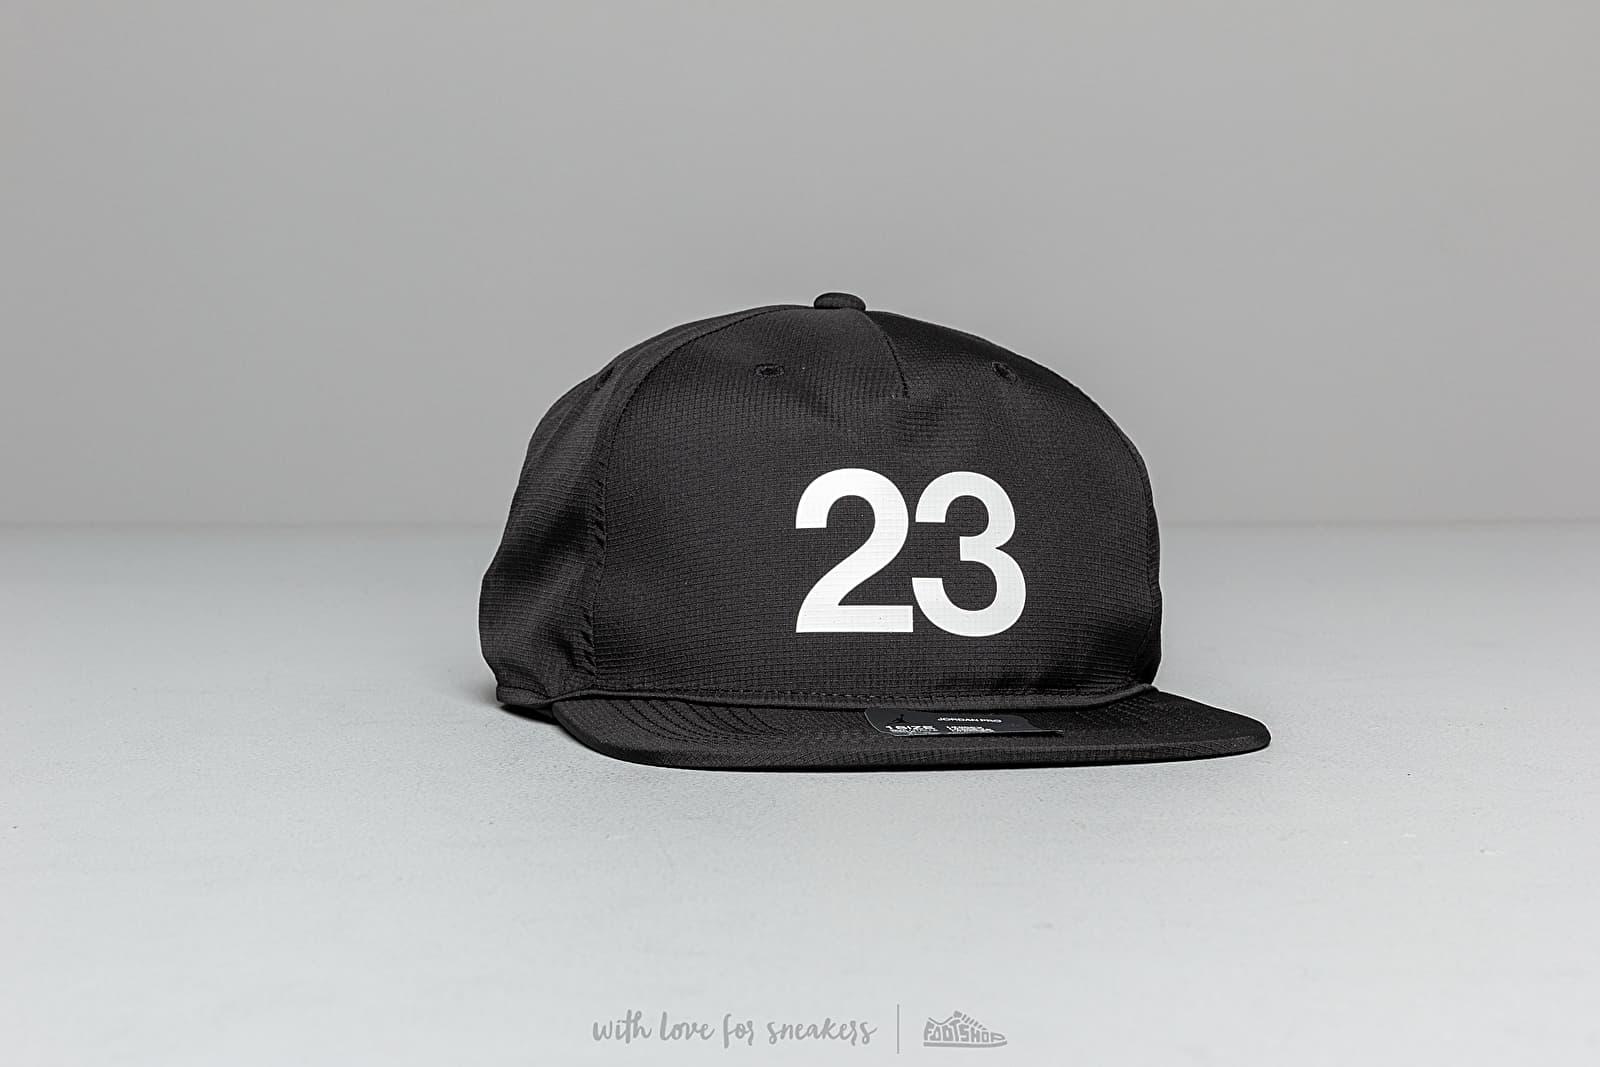 Jordan Pro3 Engineered Cap Black za skvelú cenu 31 € kúpite na Footshop.sk